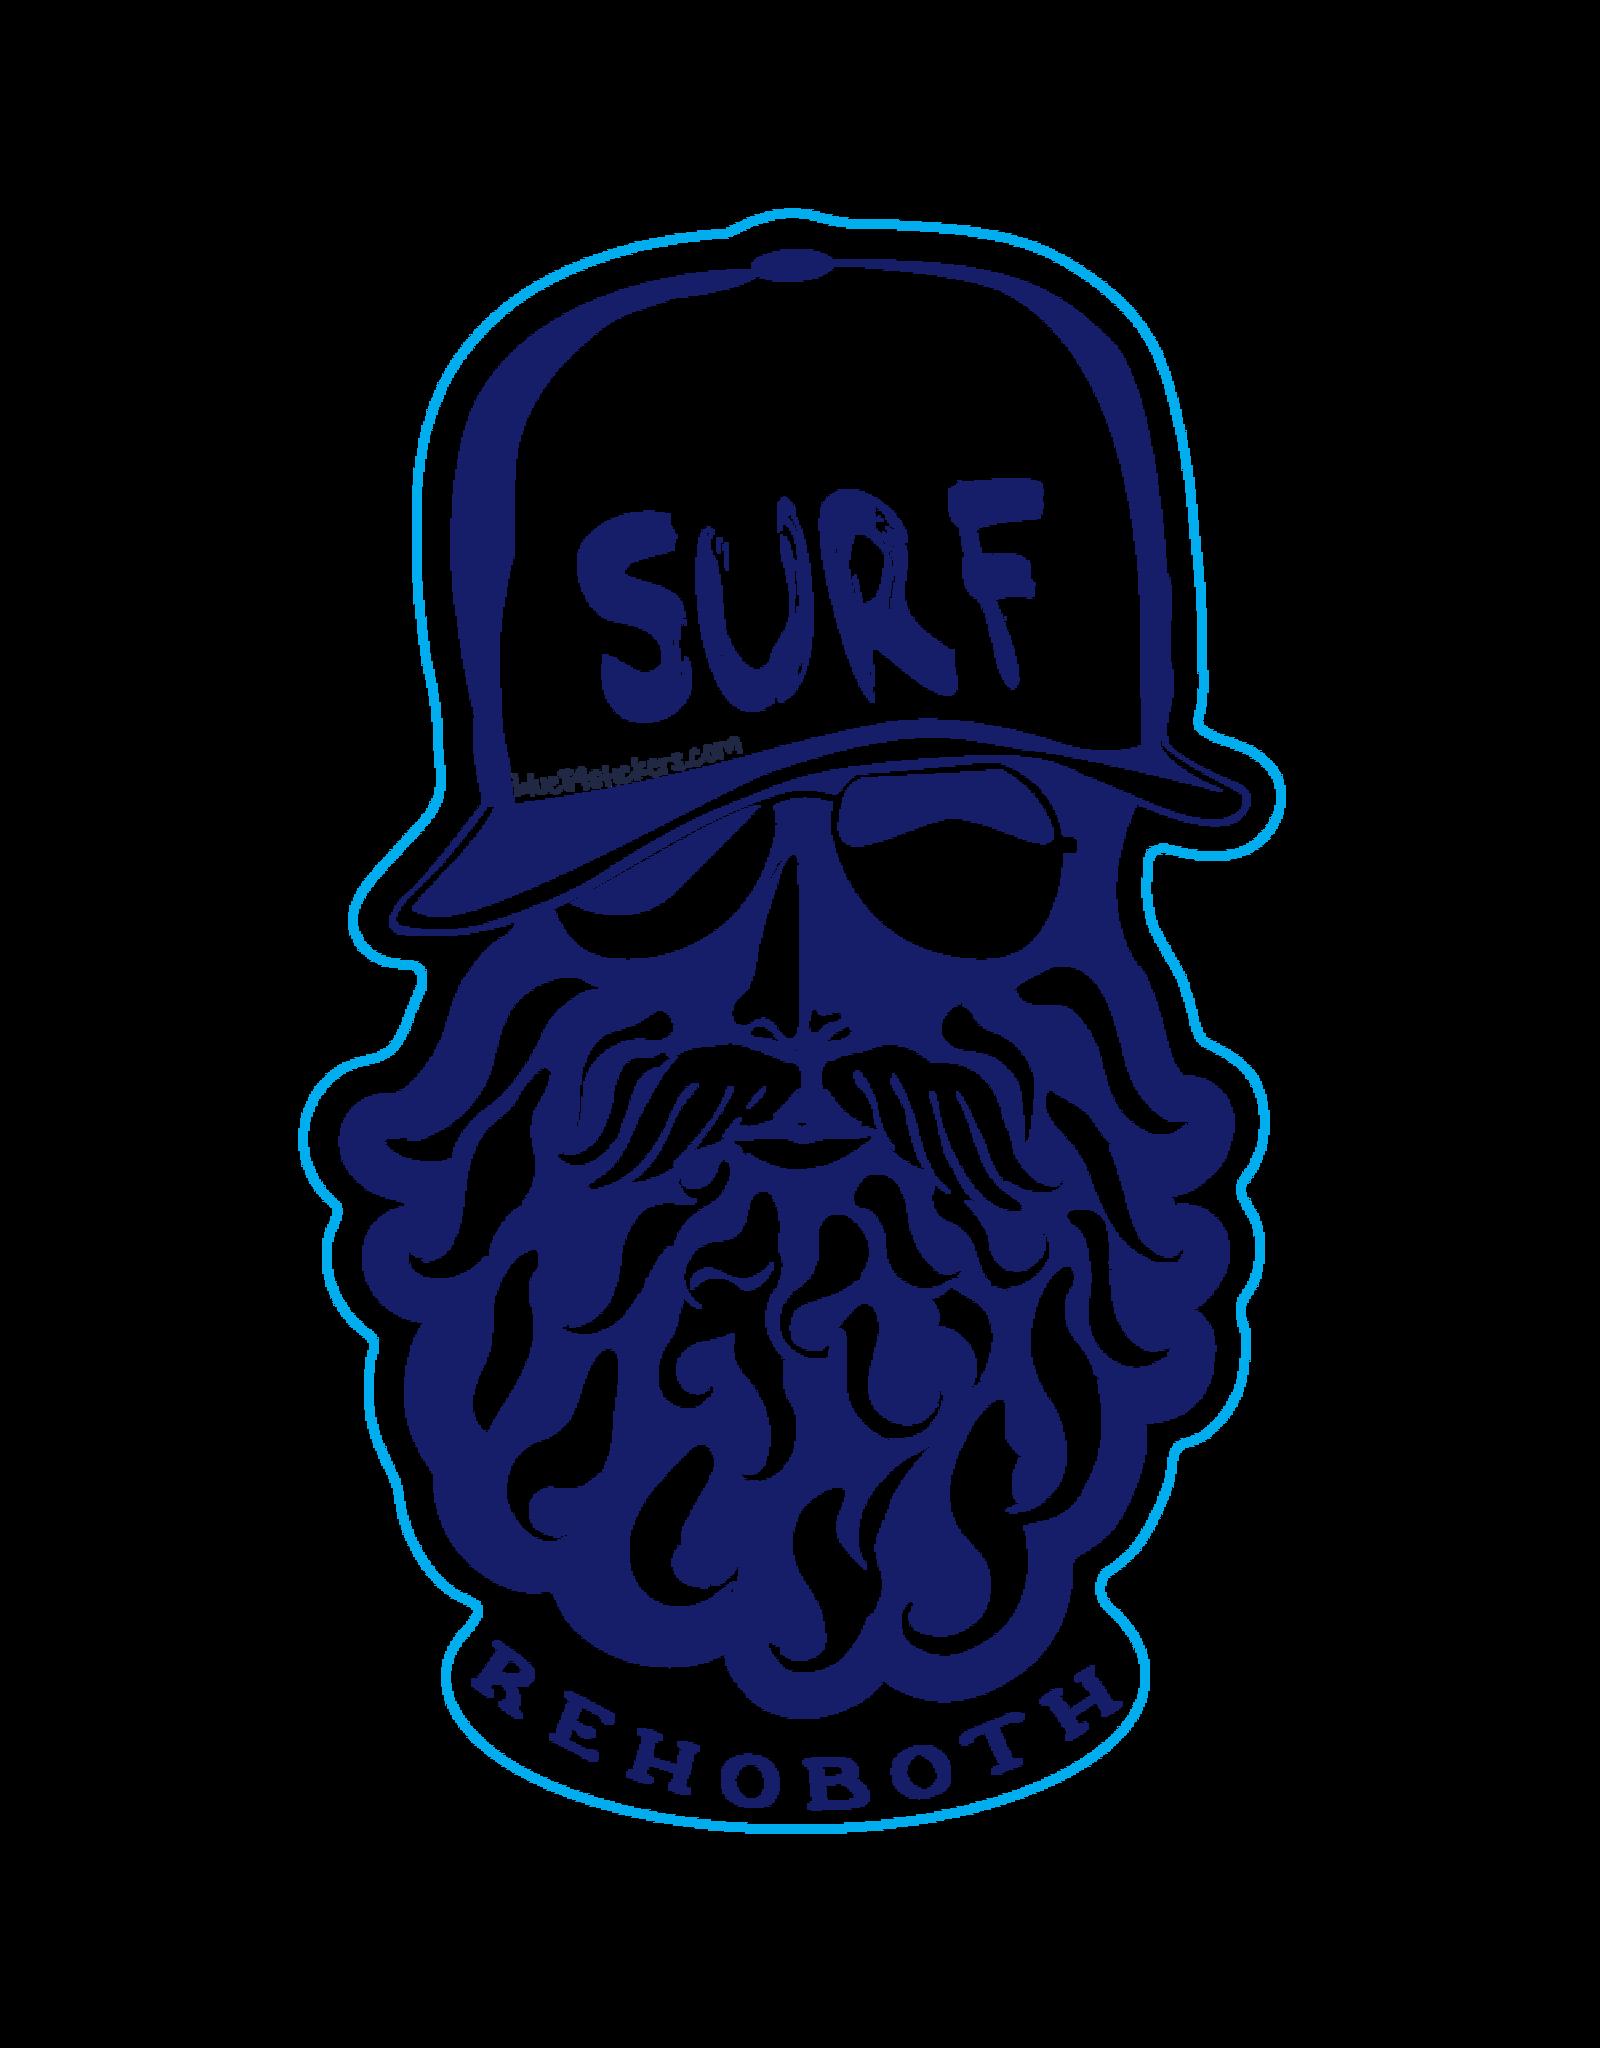 BLUE 84 BEACH STICKER BEARDY